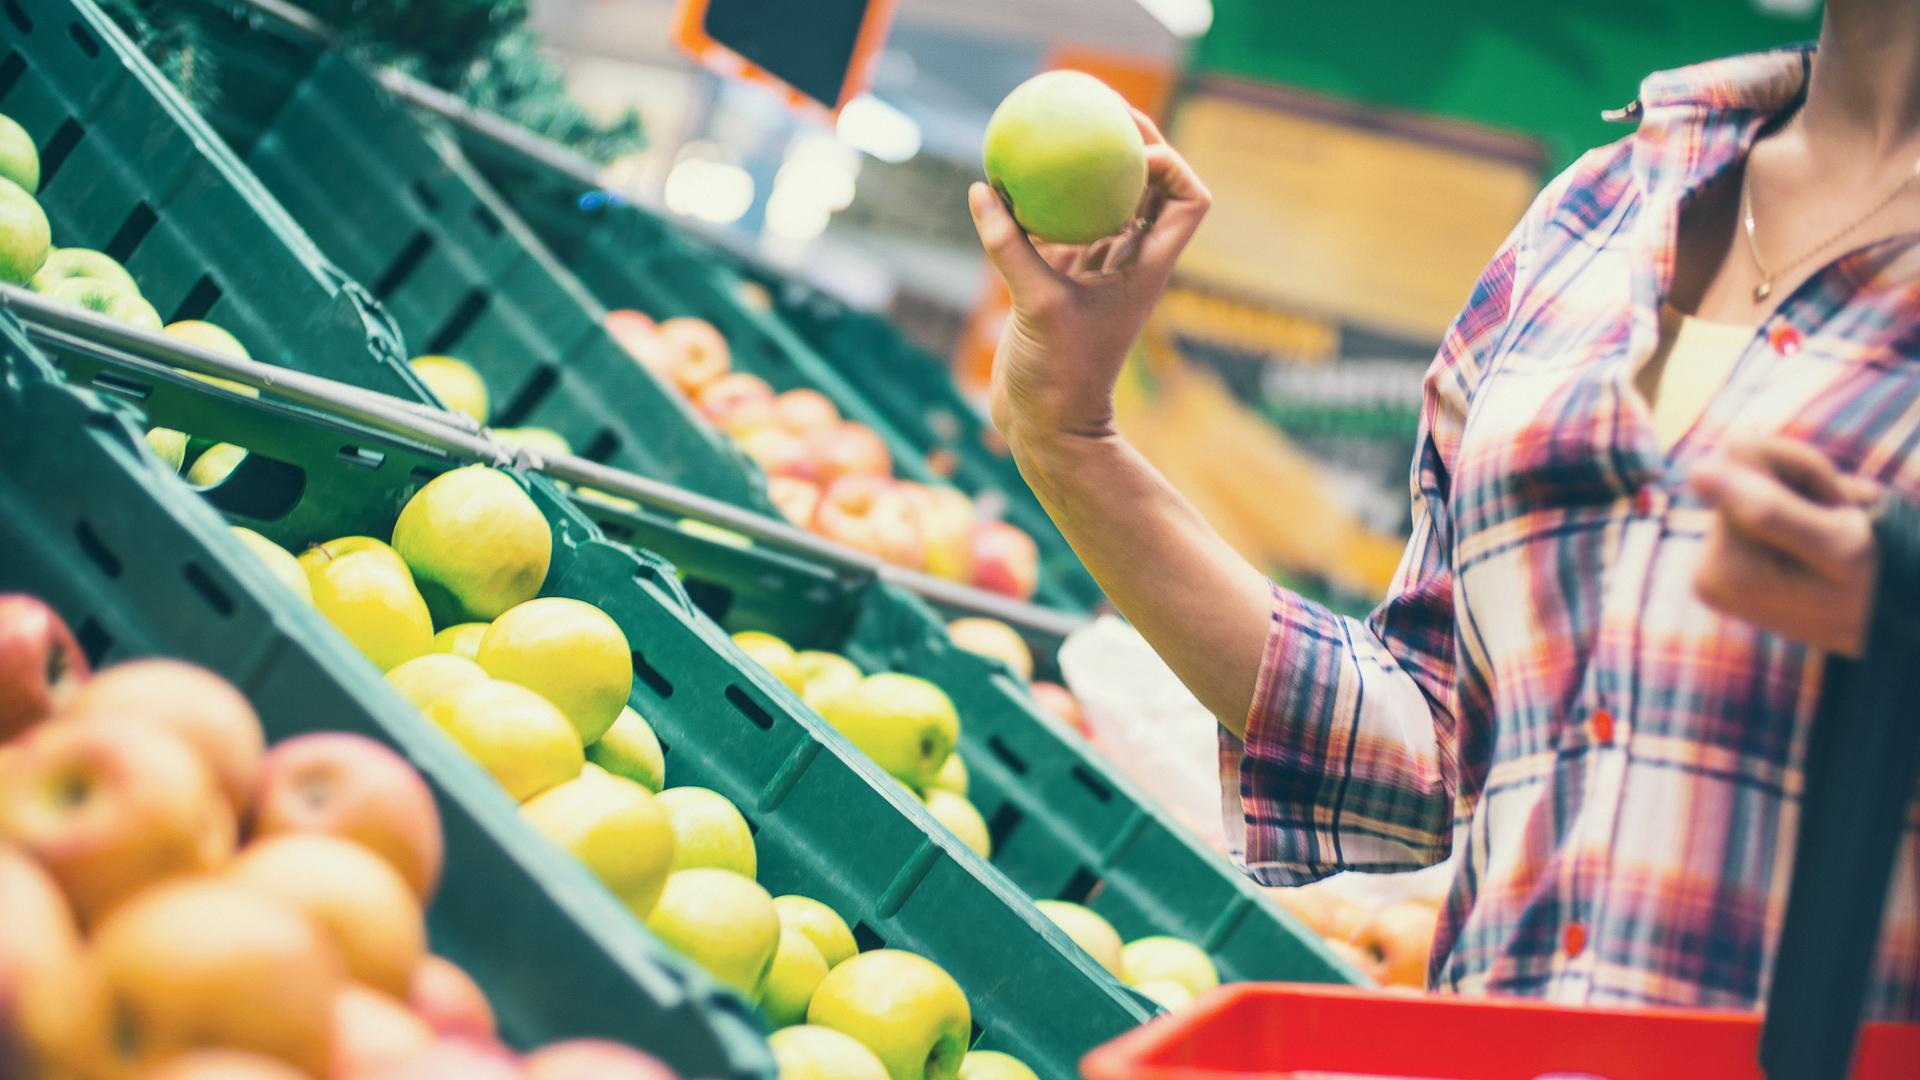 woman grocery shopping fresh produce